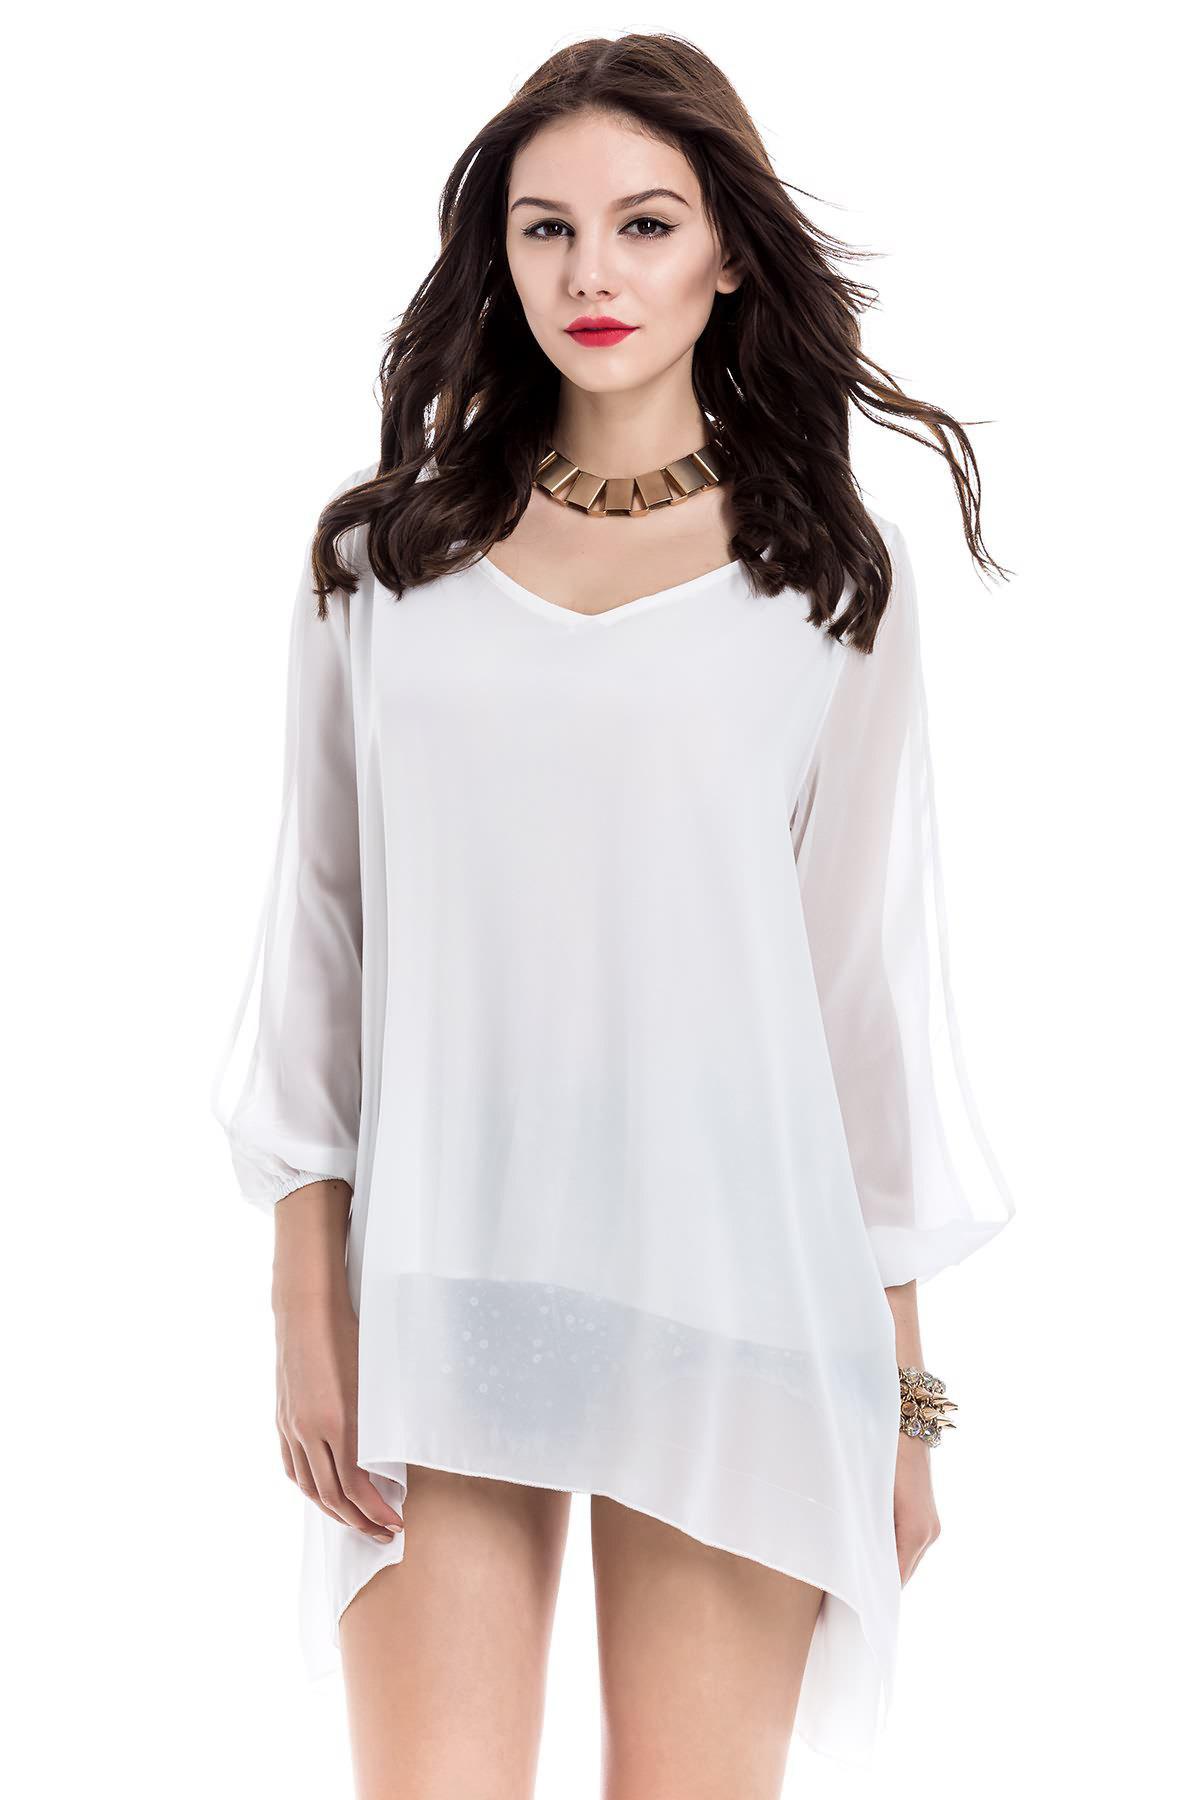 Long Sleeve Chiffon Beach Shift Dress YC0289103